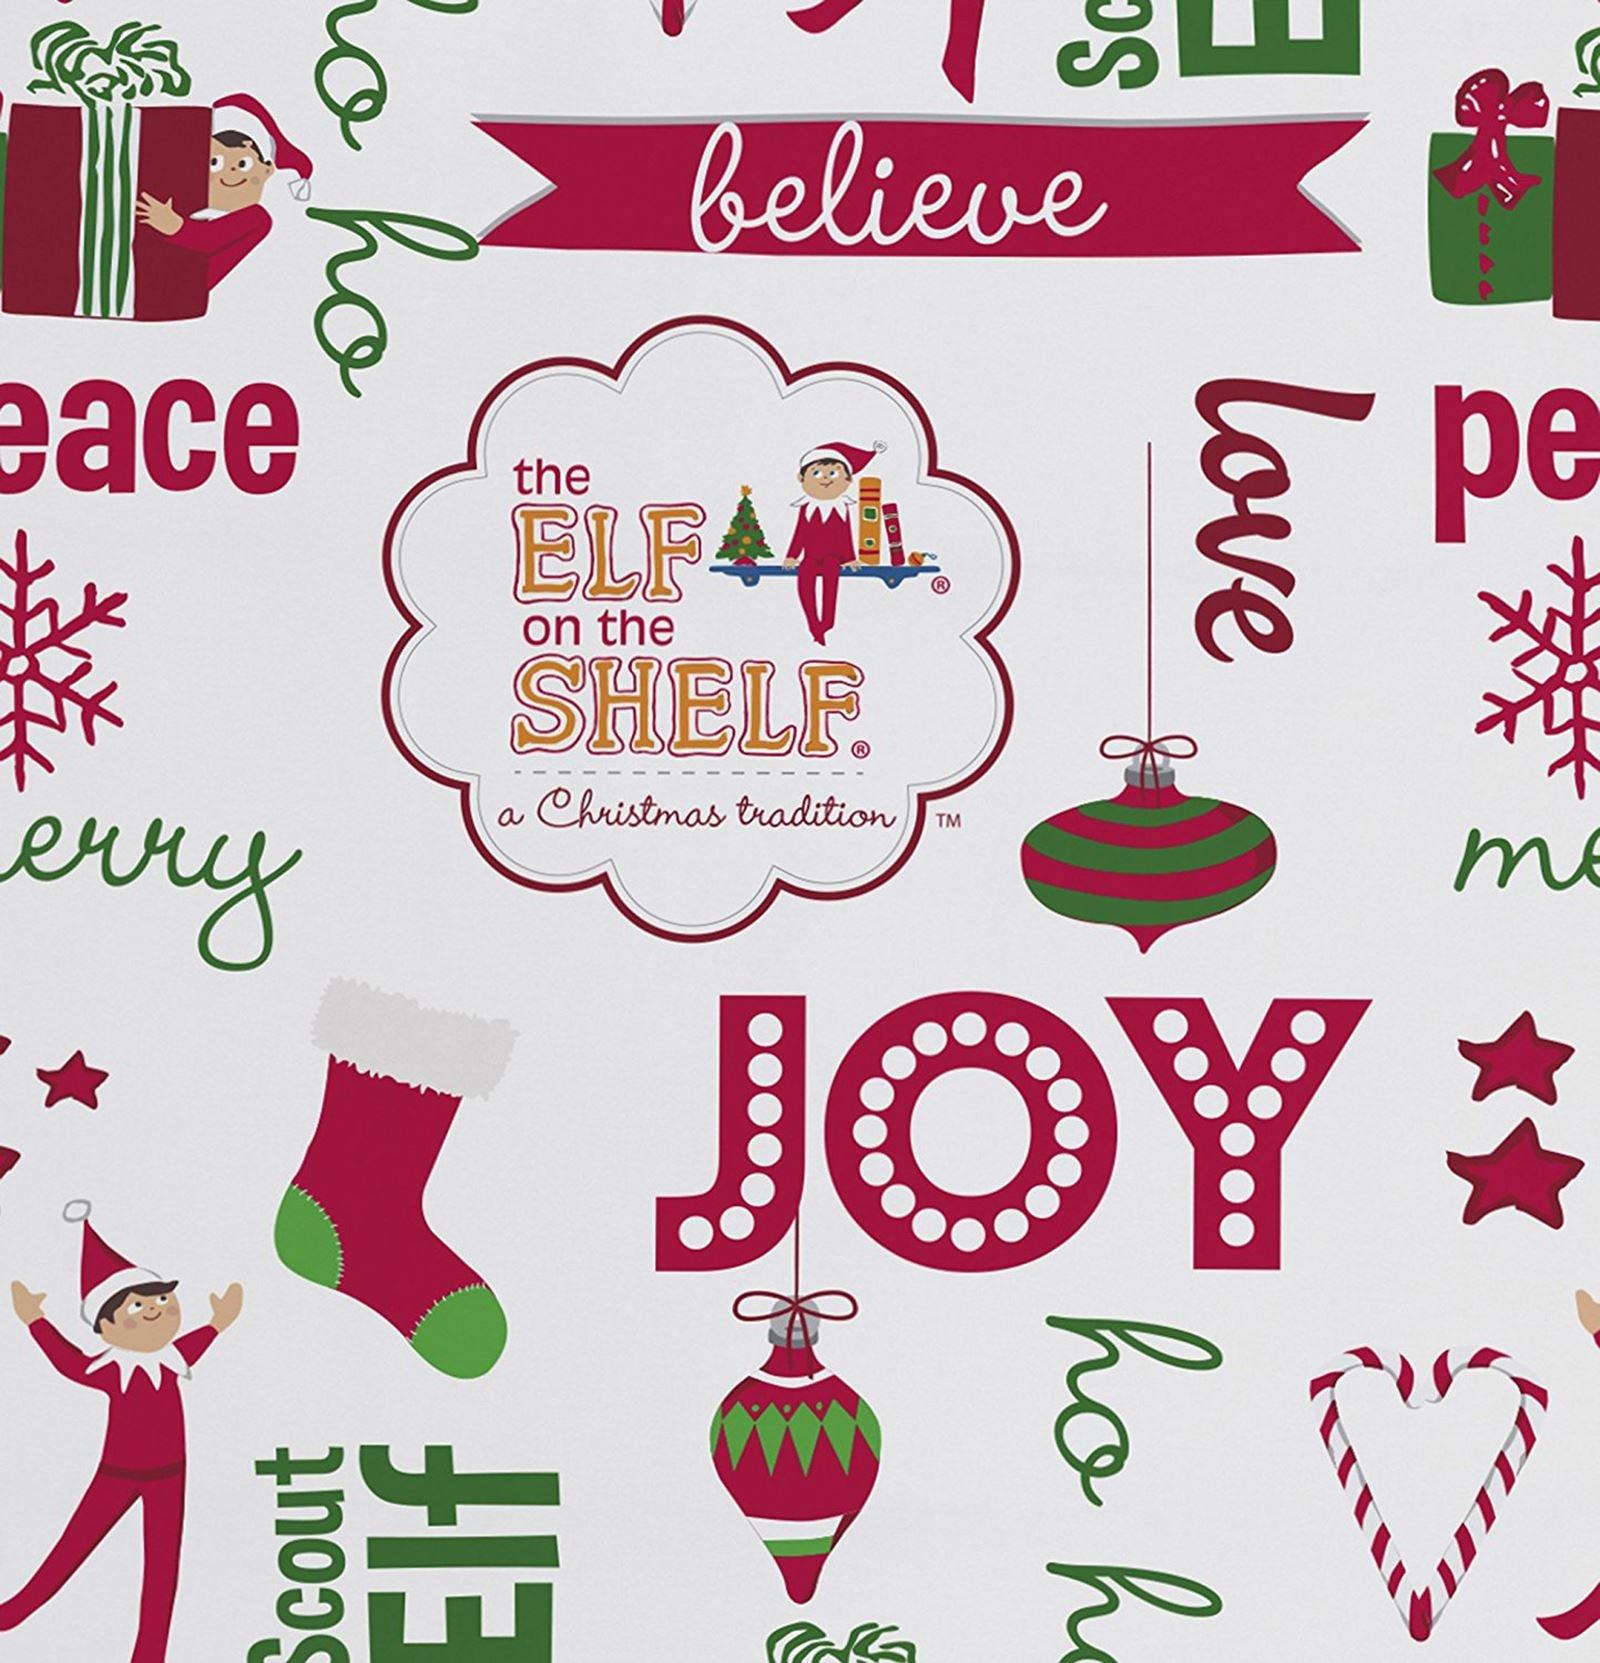 Official The Elf On The Shelf Joy Reversible UK Double /US Full Duvet Cover With 2 Pillowcases Bedding Set